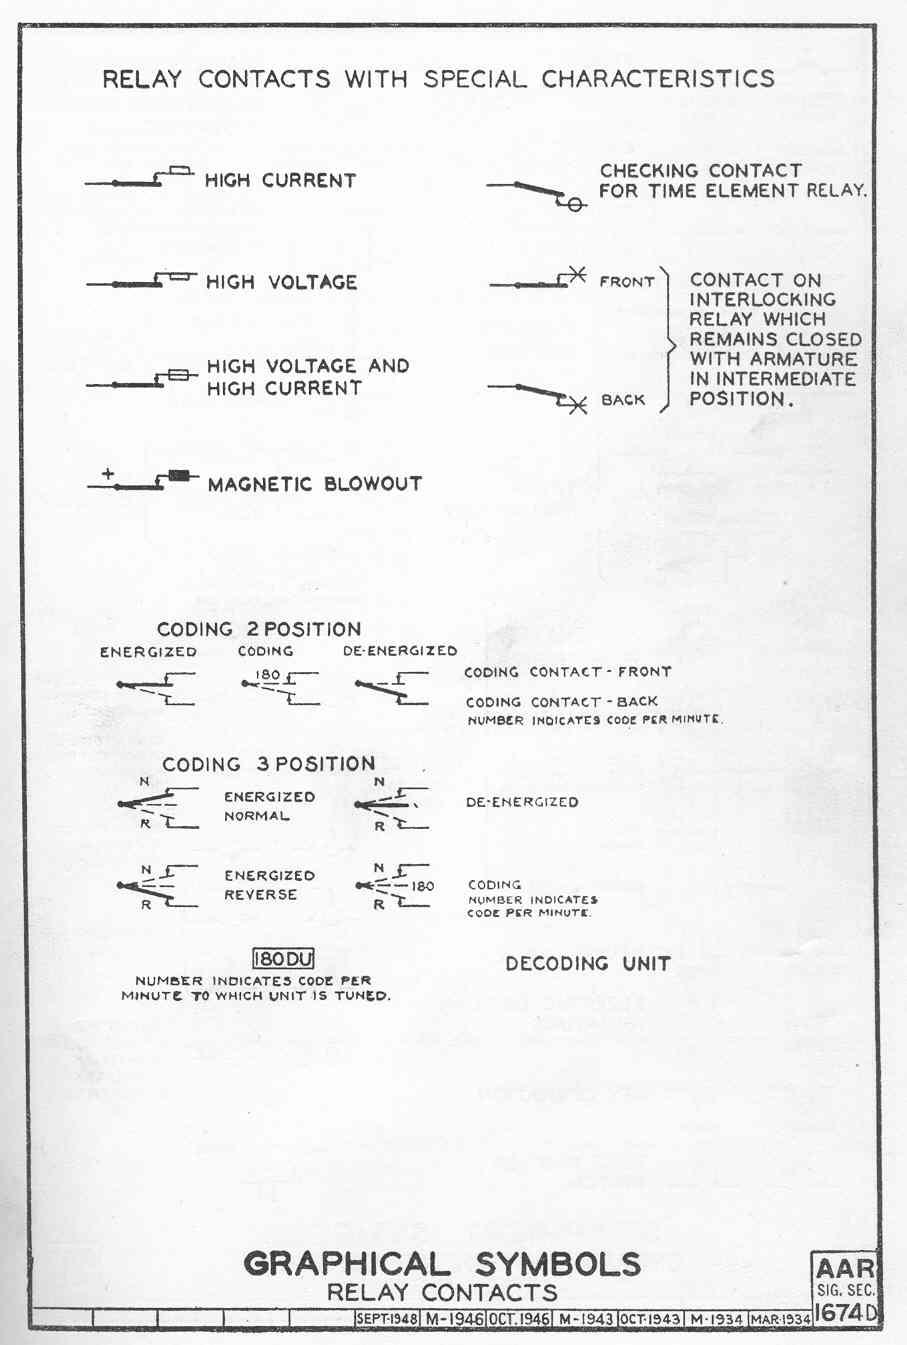 Circuit Nomenclature Symbols Electrical Relay Pdf